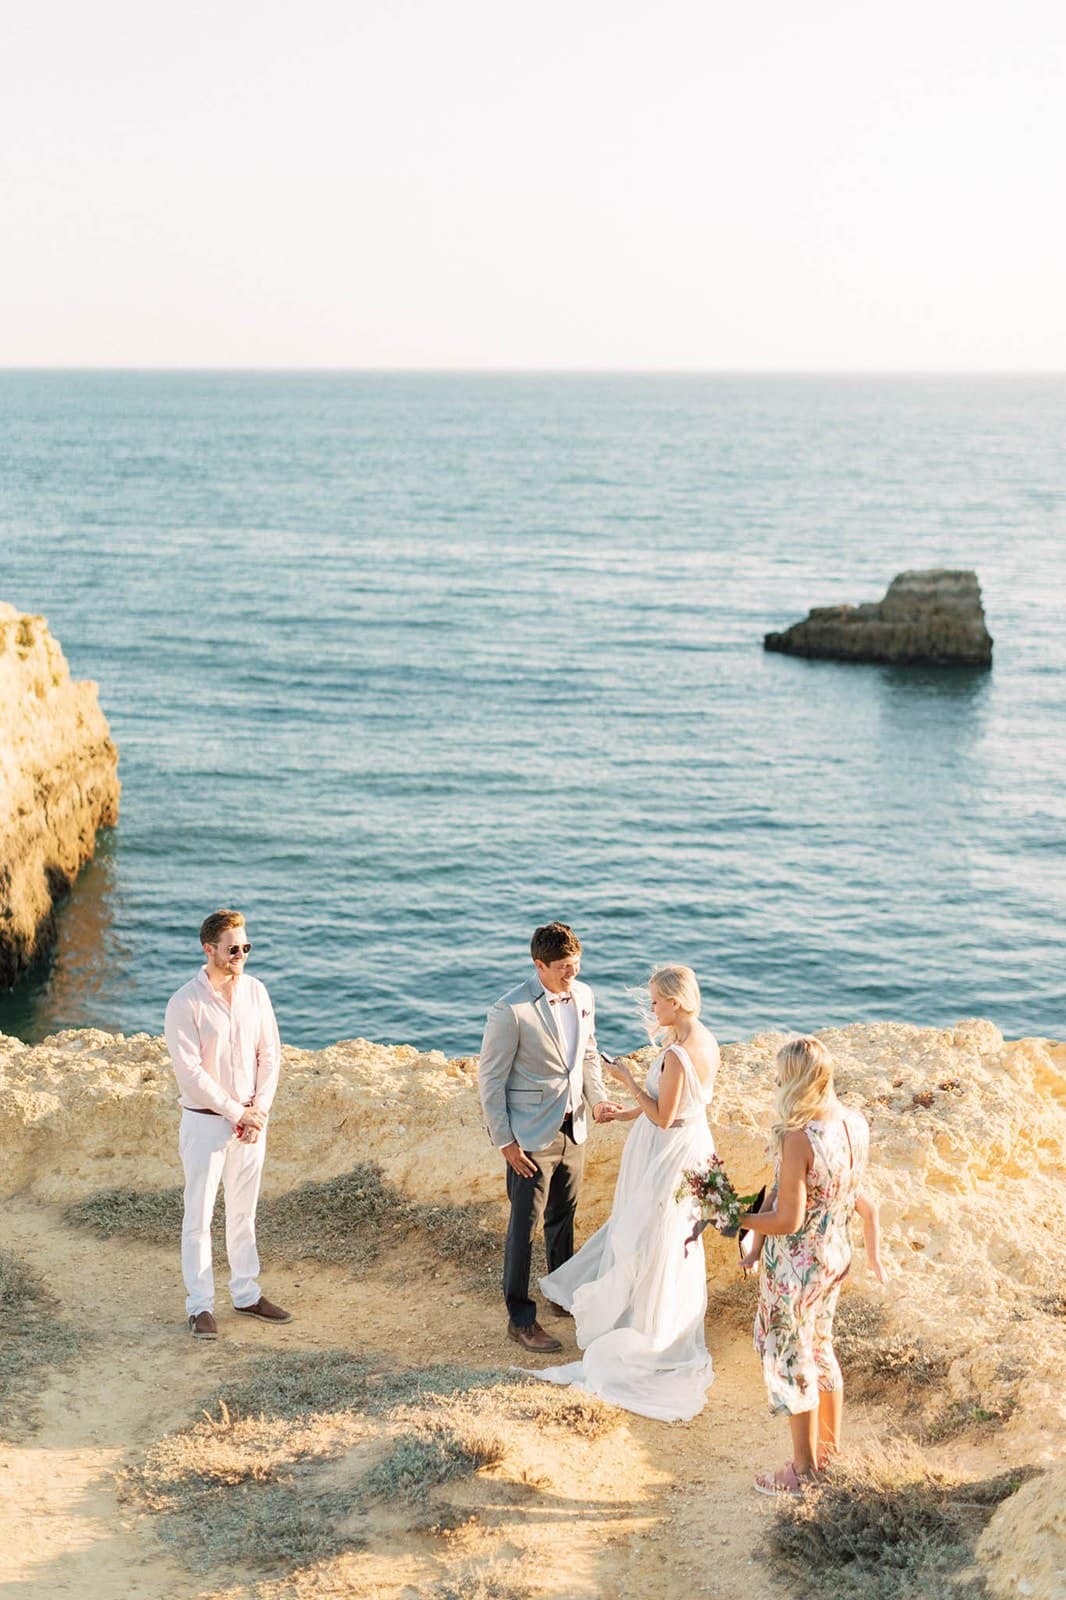 portugal ocean cliffside views